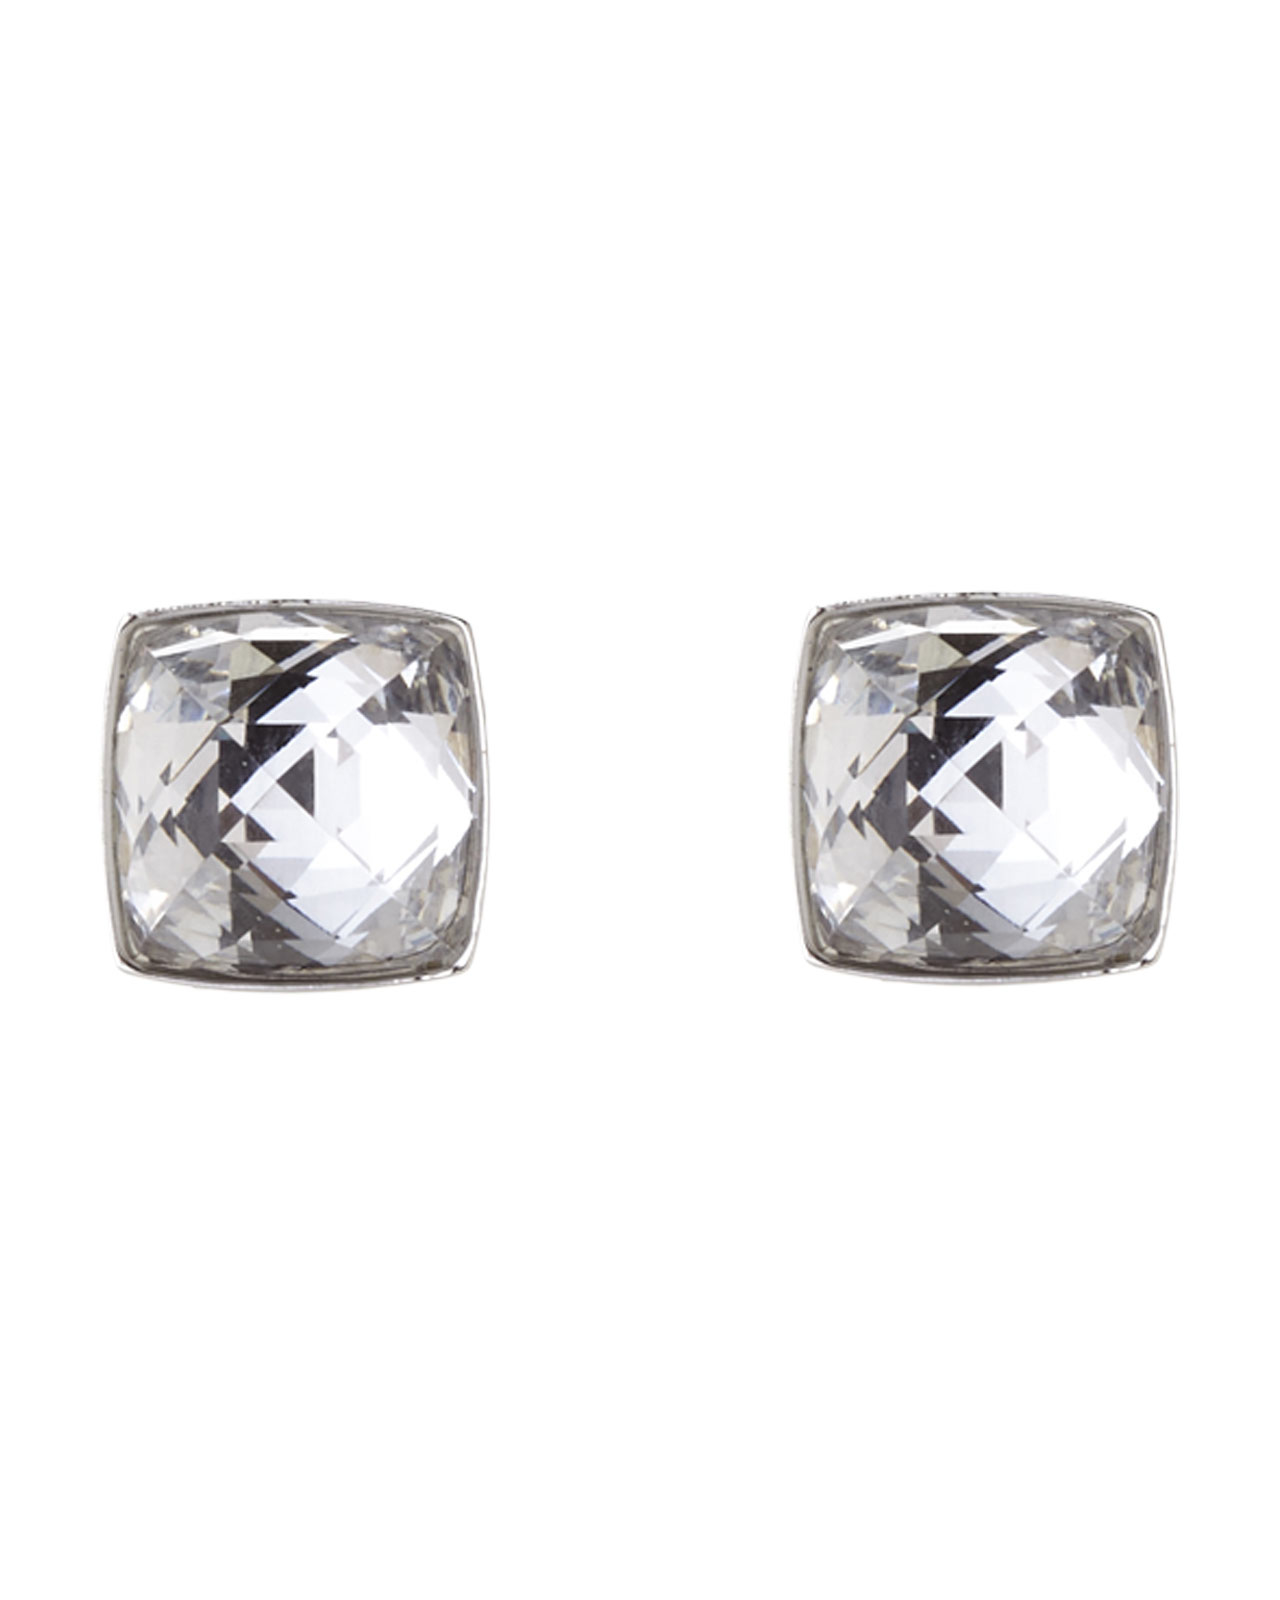 3bd627a11aab Lyst - Swarovski Silver-Tone Square Crystal Earrings in Metallic